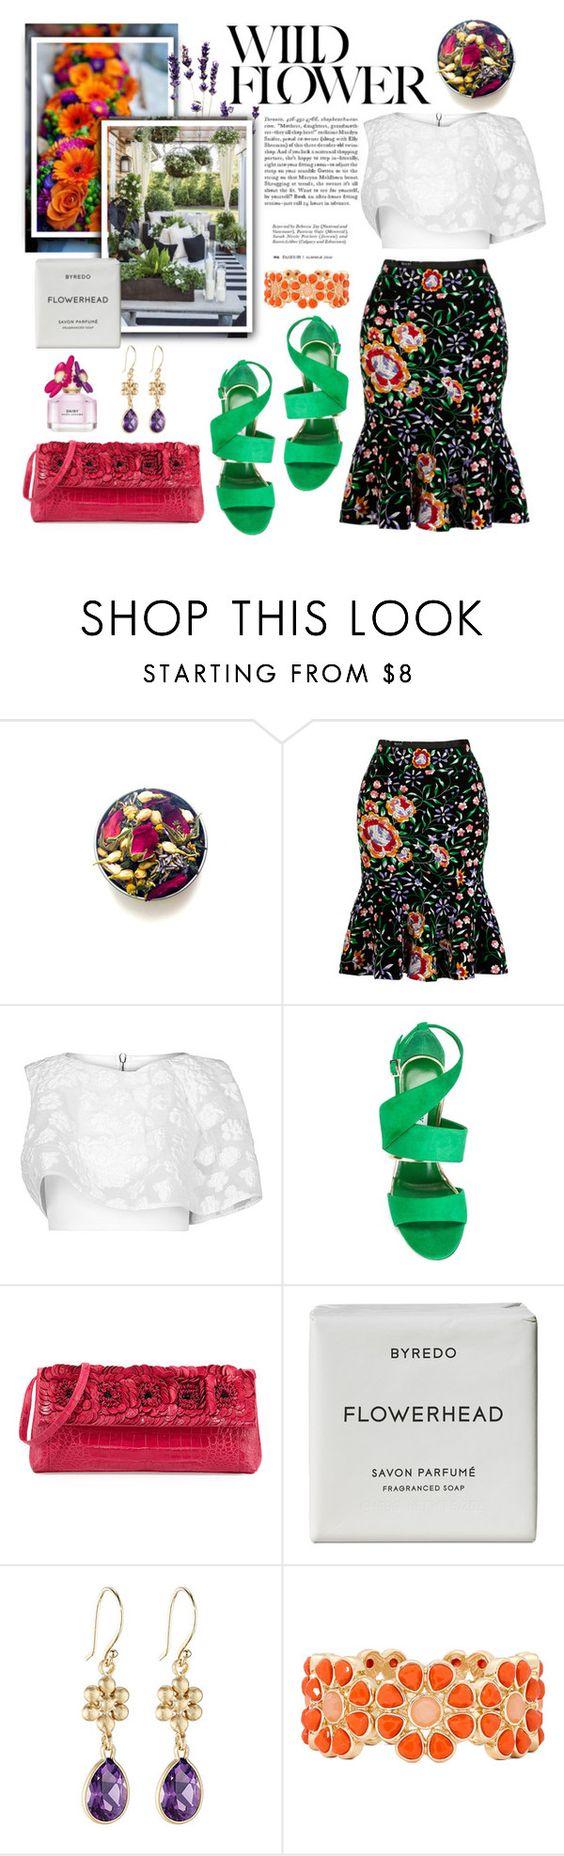 """Floral."" by vigilexi ❤ liked on Polyvore featuring Mochi, Maticevski, Jimmy Choo, Nancy Gonzalez, Byredo, Lauren Sigman Jewelry, Liz Claiborne and Marc Jacobs"